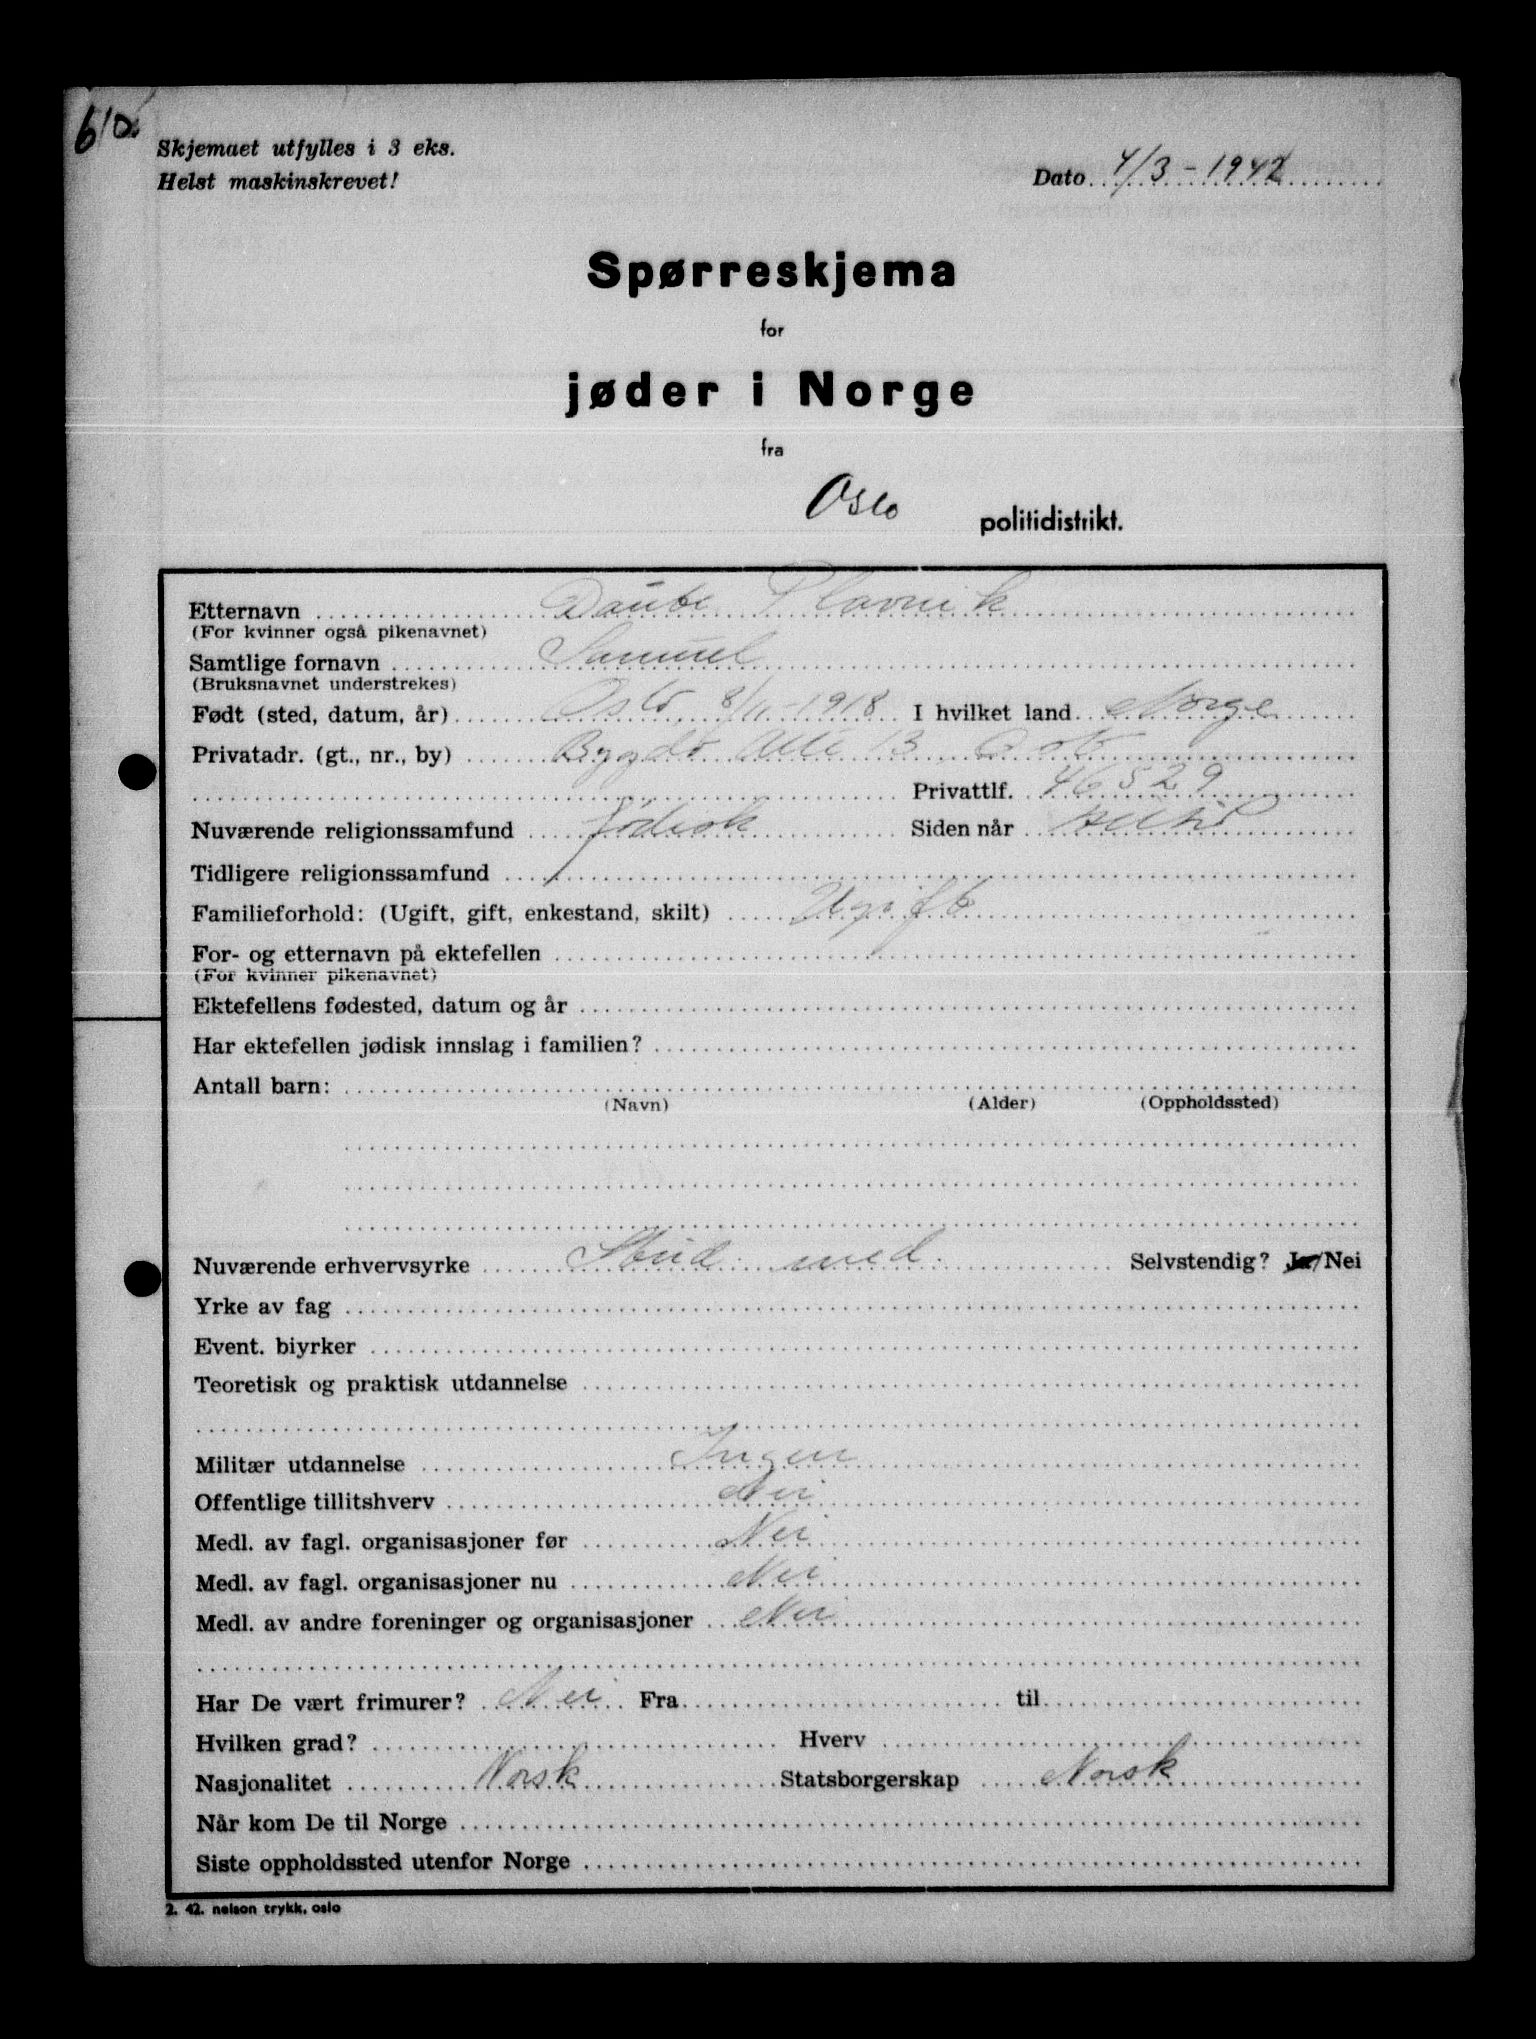 RA, Statspolitiet - Hovedkontoret / Osloavdelingen, G/Ga/L0011: Spørreskjema for jøder i Norge, Oslo Plavnik-Zwillinger, og Aker Adler-Lewin, 1942, s. 1